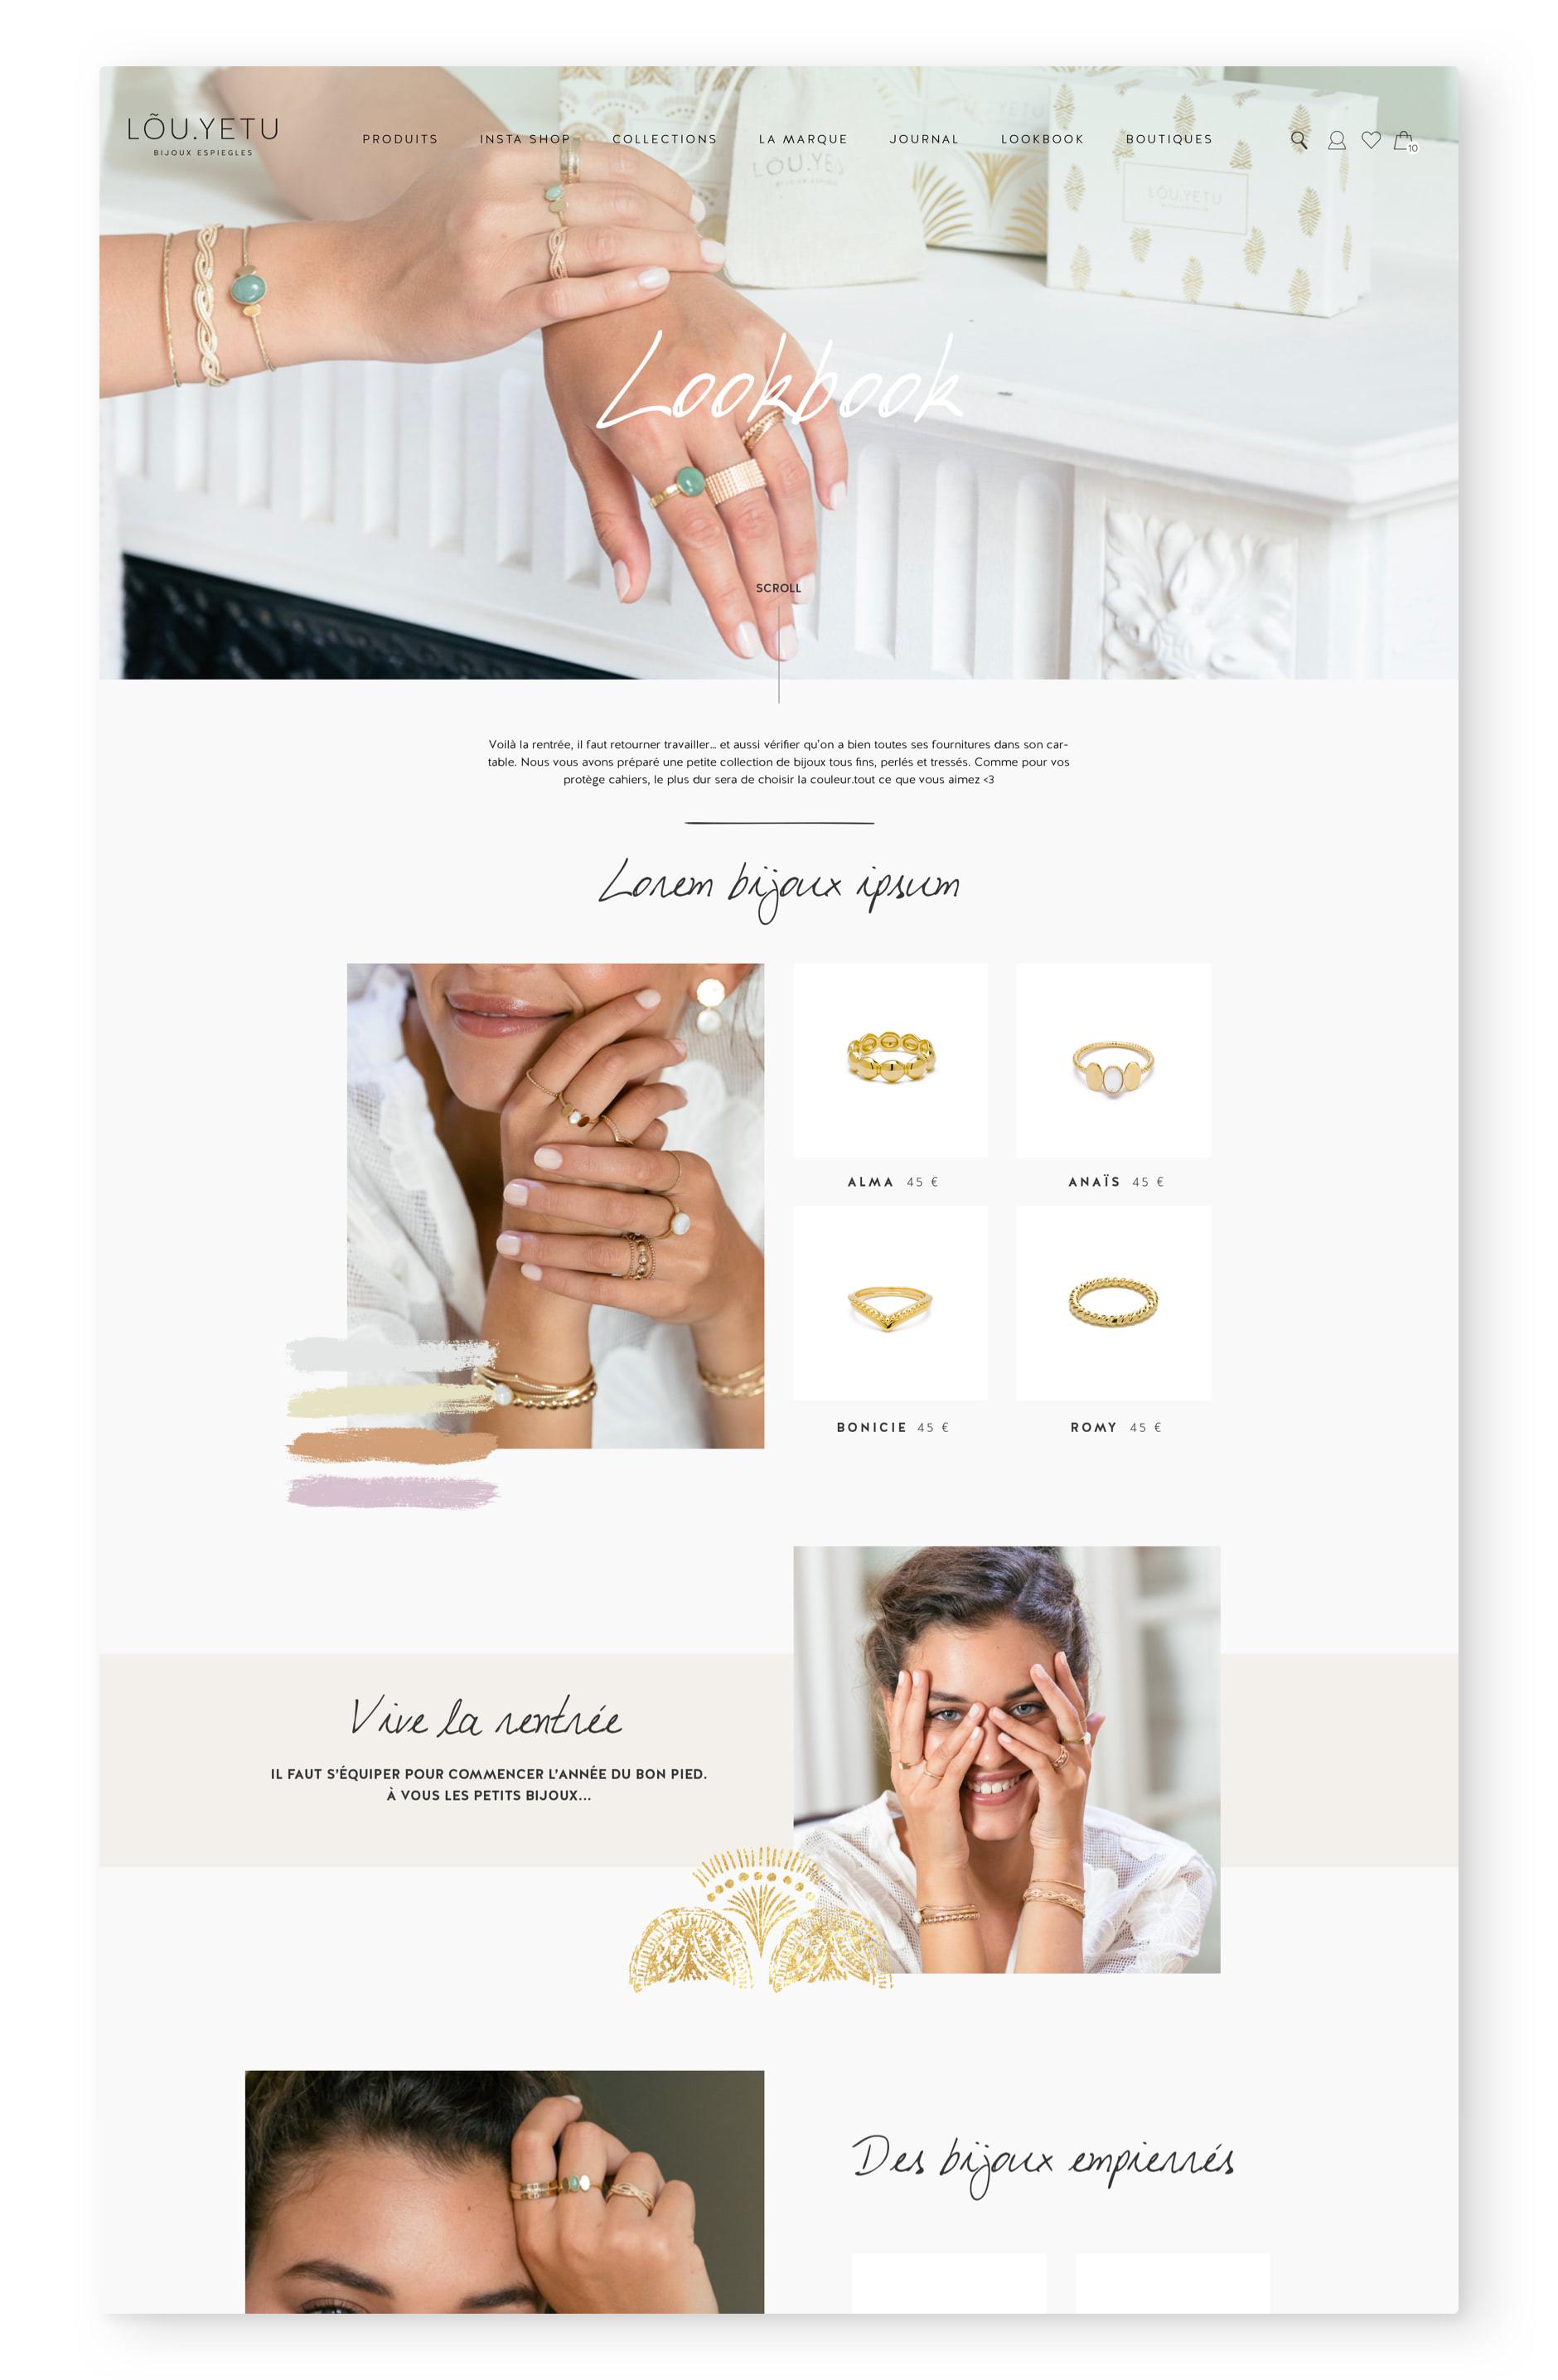 projet-lou_yetu-bijoux-website_design-robin_p_07@2x